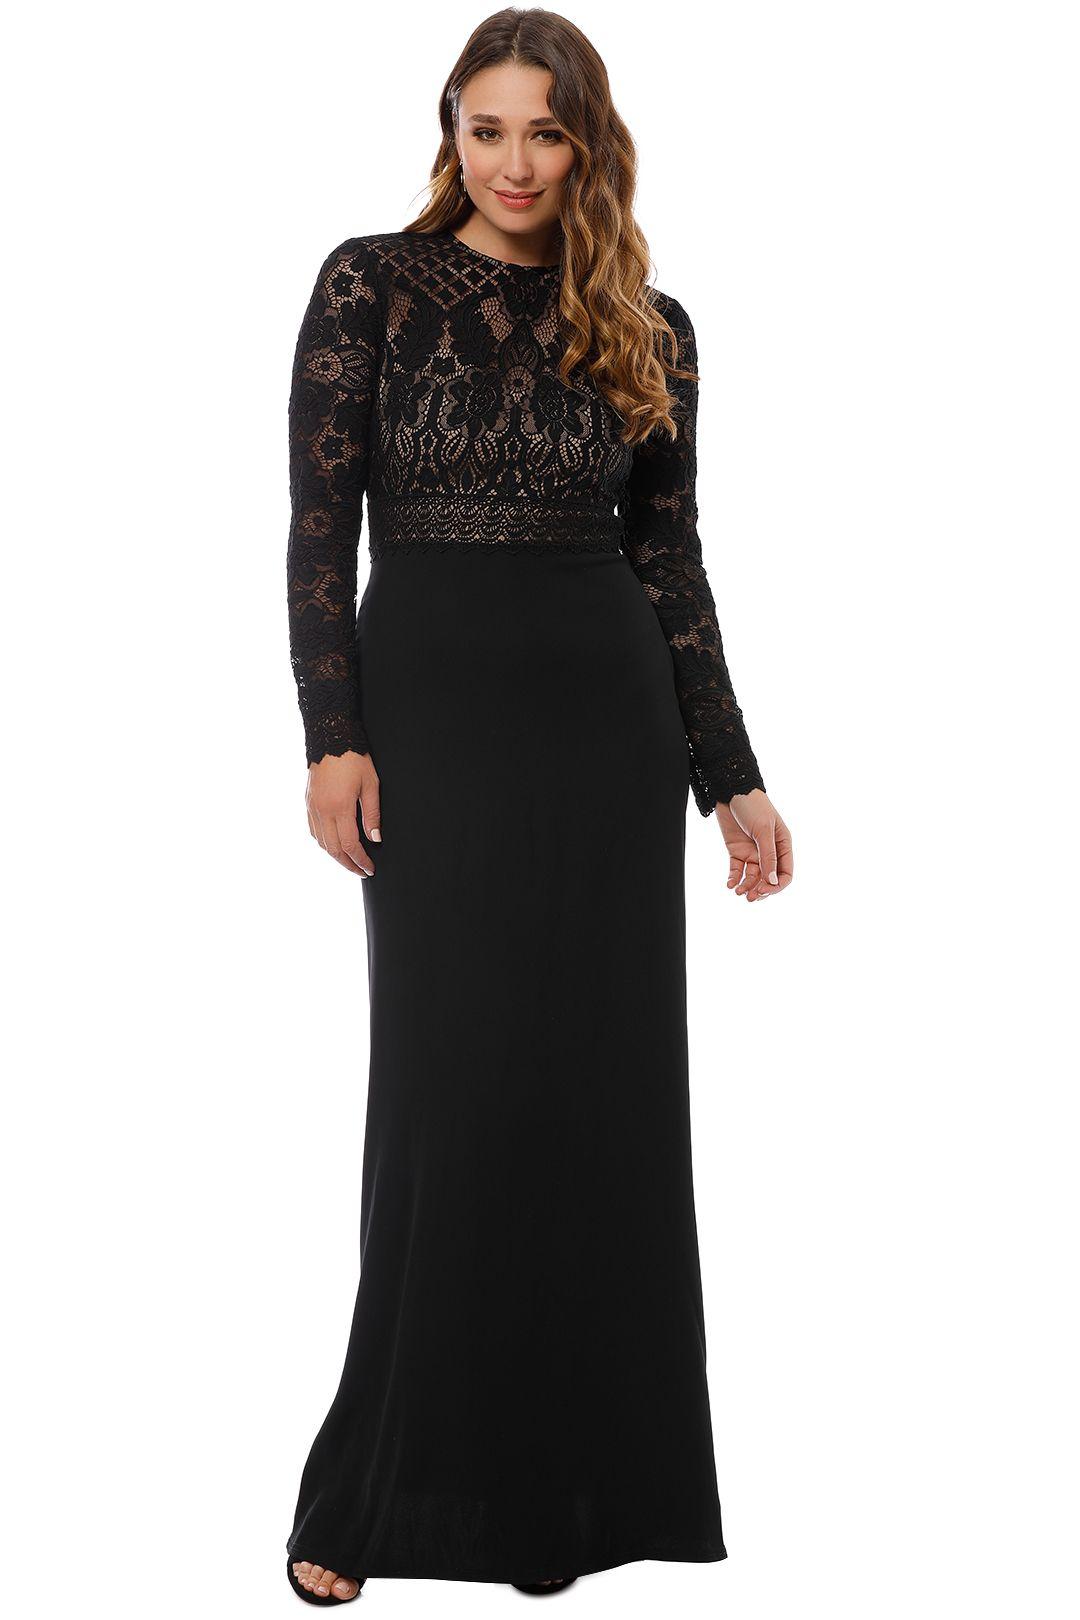 Tadashi Shoji - Benes Long Sleeve Gown - Black - Front